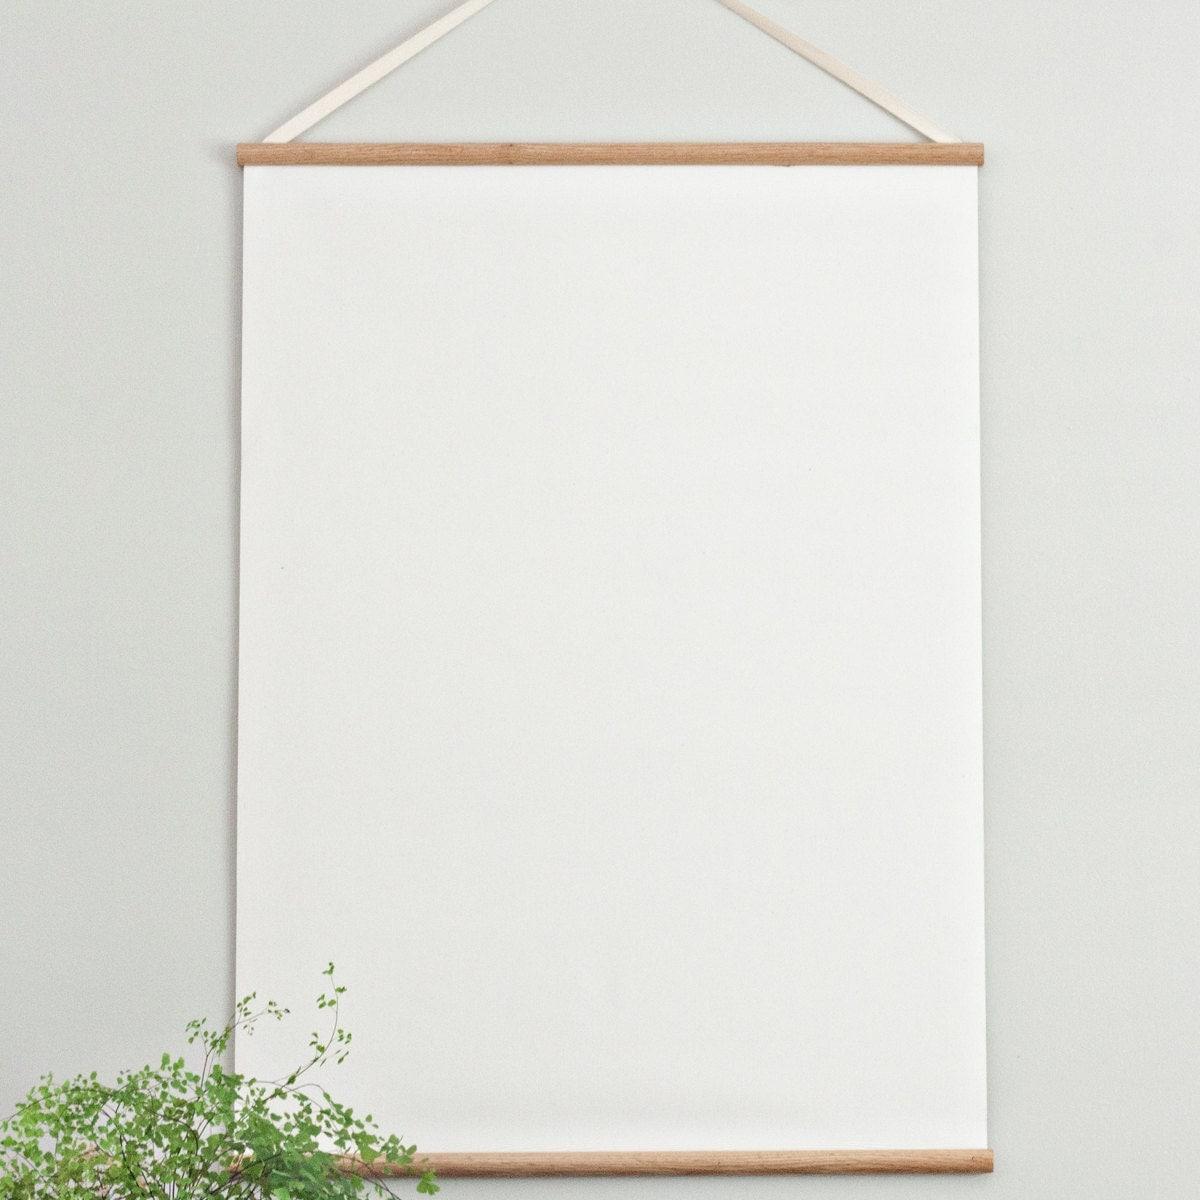 Amazing Grace  - Large canvas wall hanging